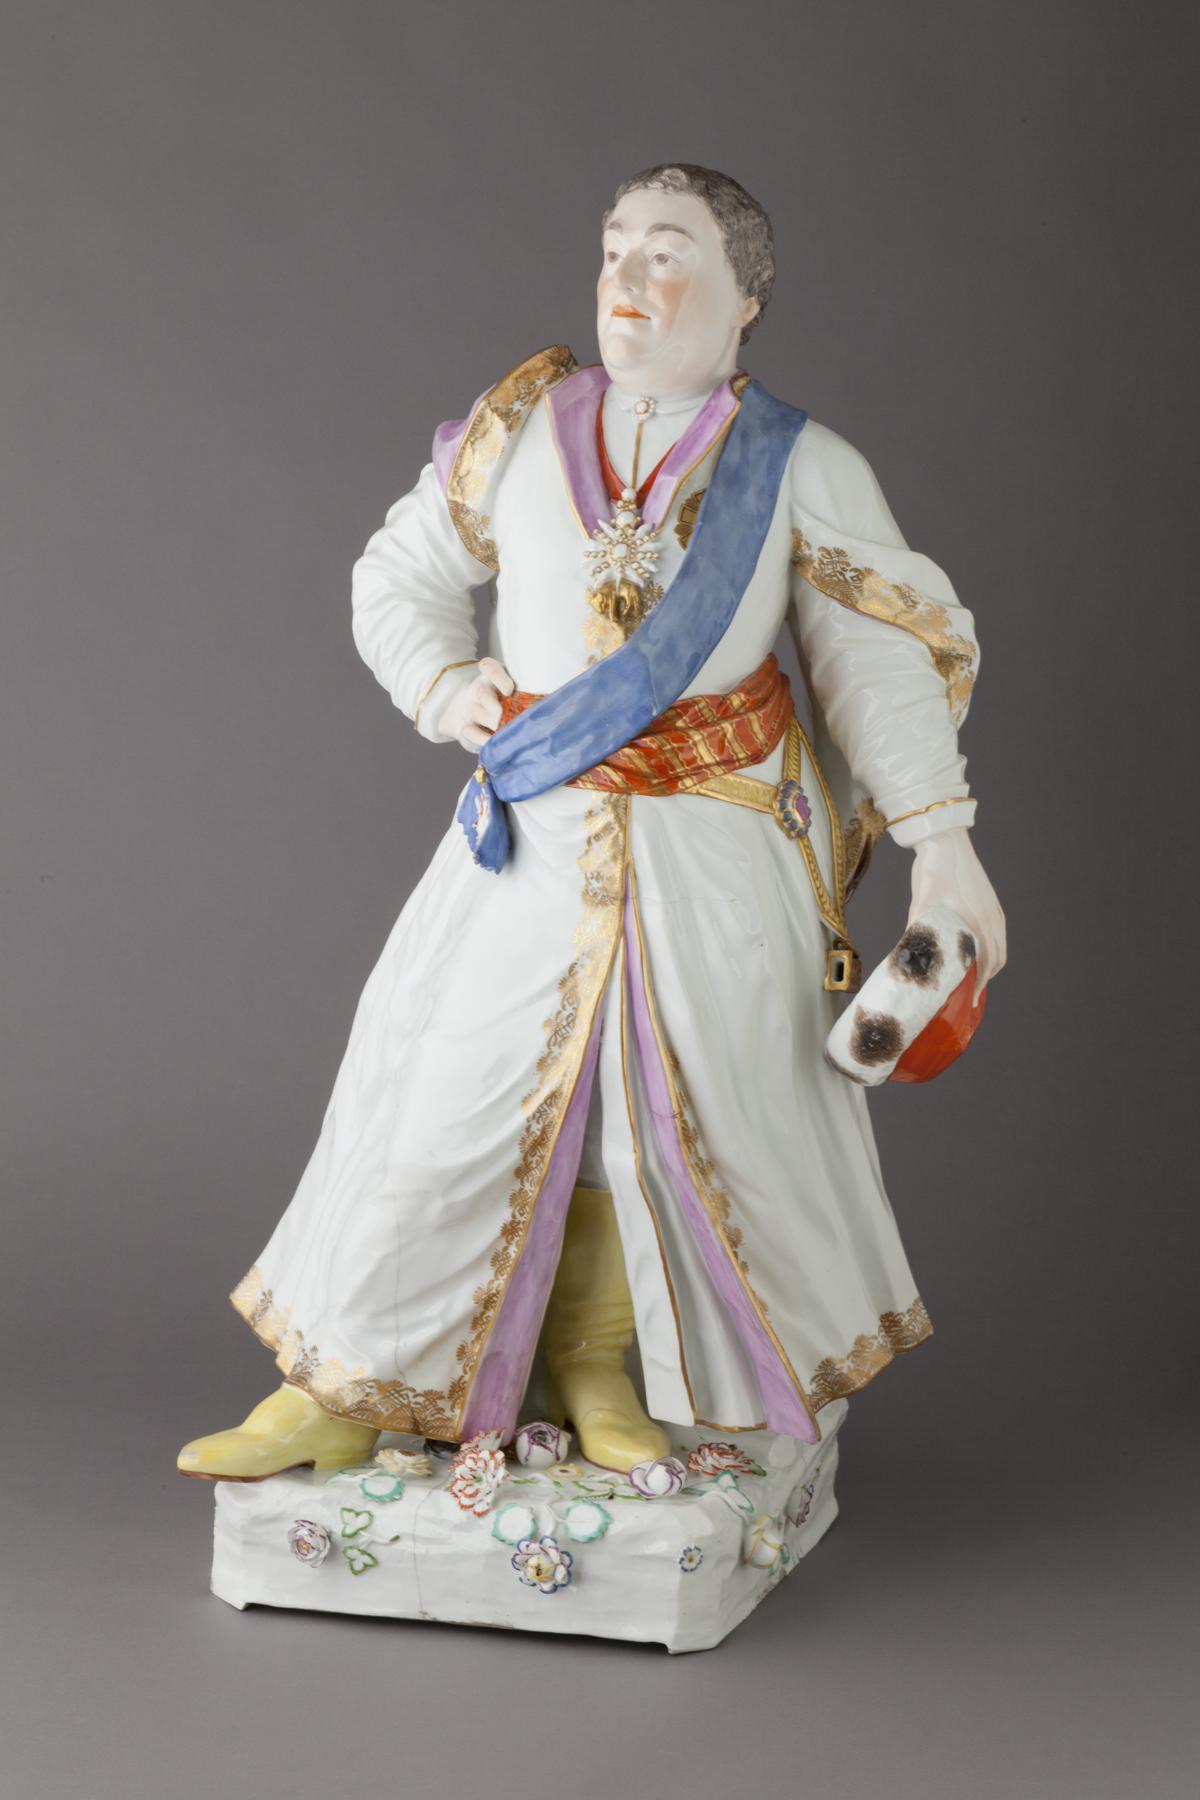 Meissen Porcelain Manufactory (Dresden, Germany, established 1710). Augustus III, King of Poland, 18th century. Glazed porcelain, with polychrome overglaze decoration, and gilding, 30 × 16 1/2 × 13 1/4 in. (76.2 × 41.91 × 33.66 cm). Milwaukee Art Museum, Gift of the René von Schleinitz Foundation, M1962.364. Photo credit: John R. Glembin